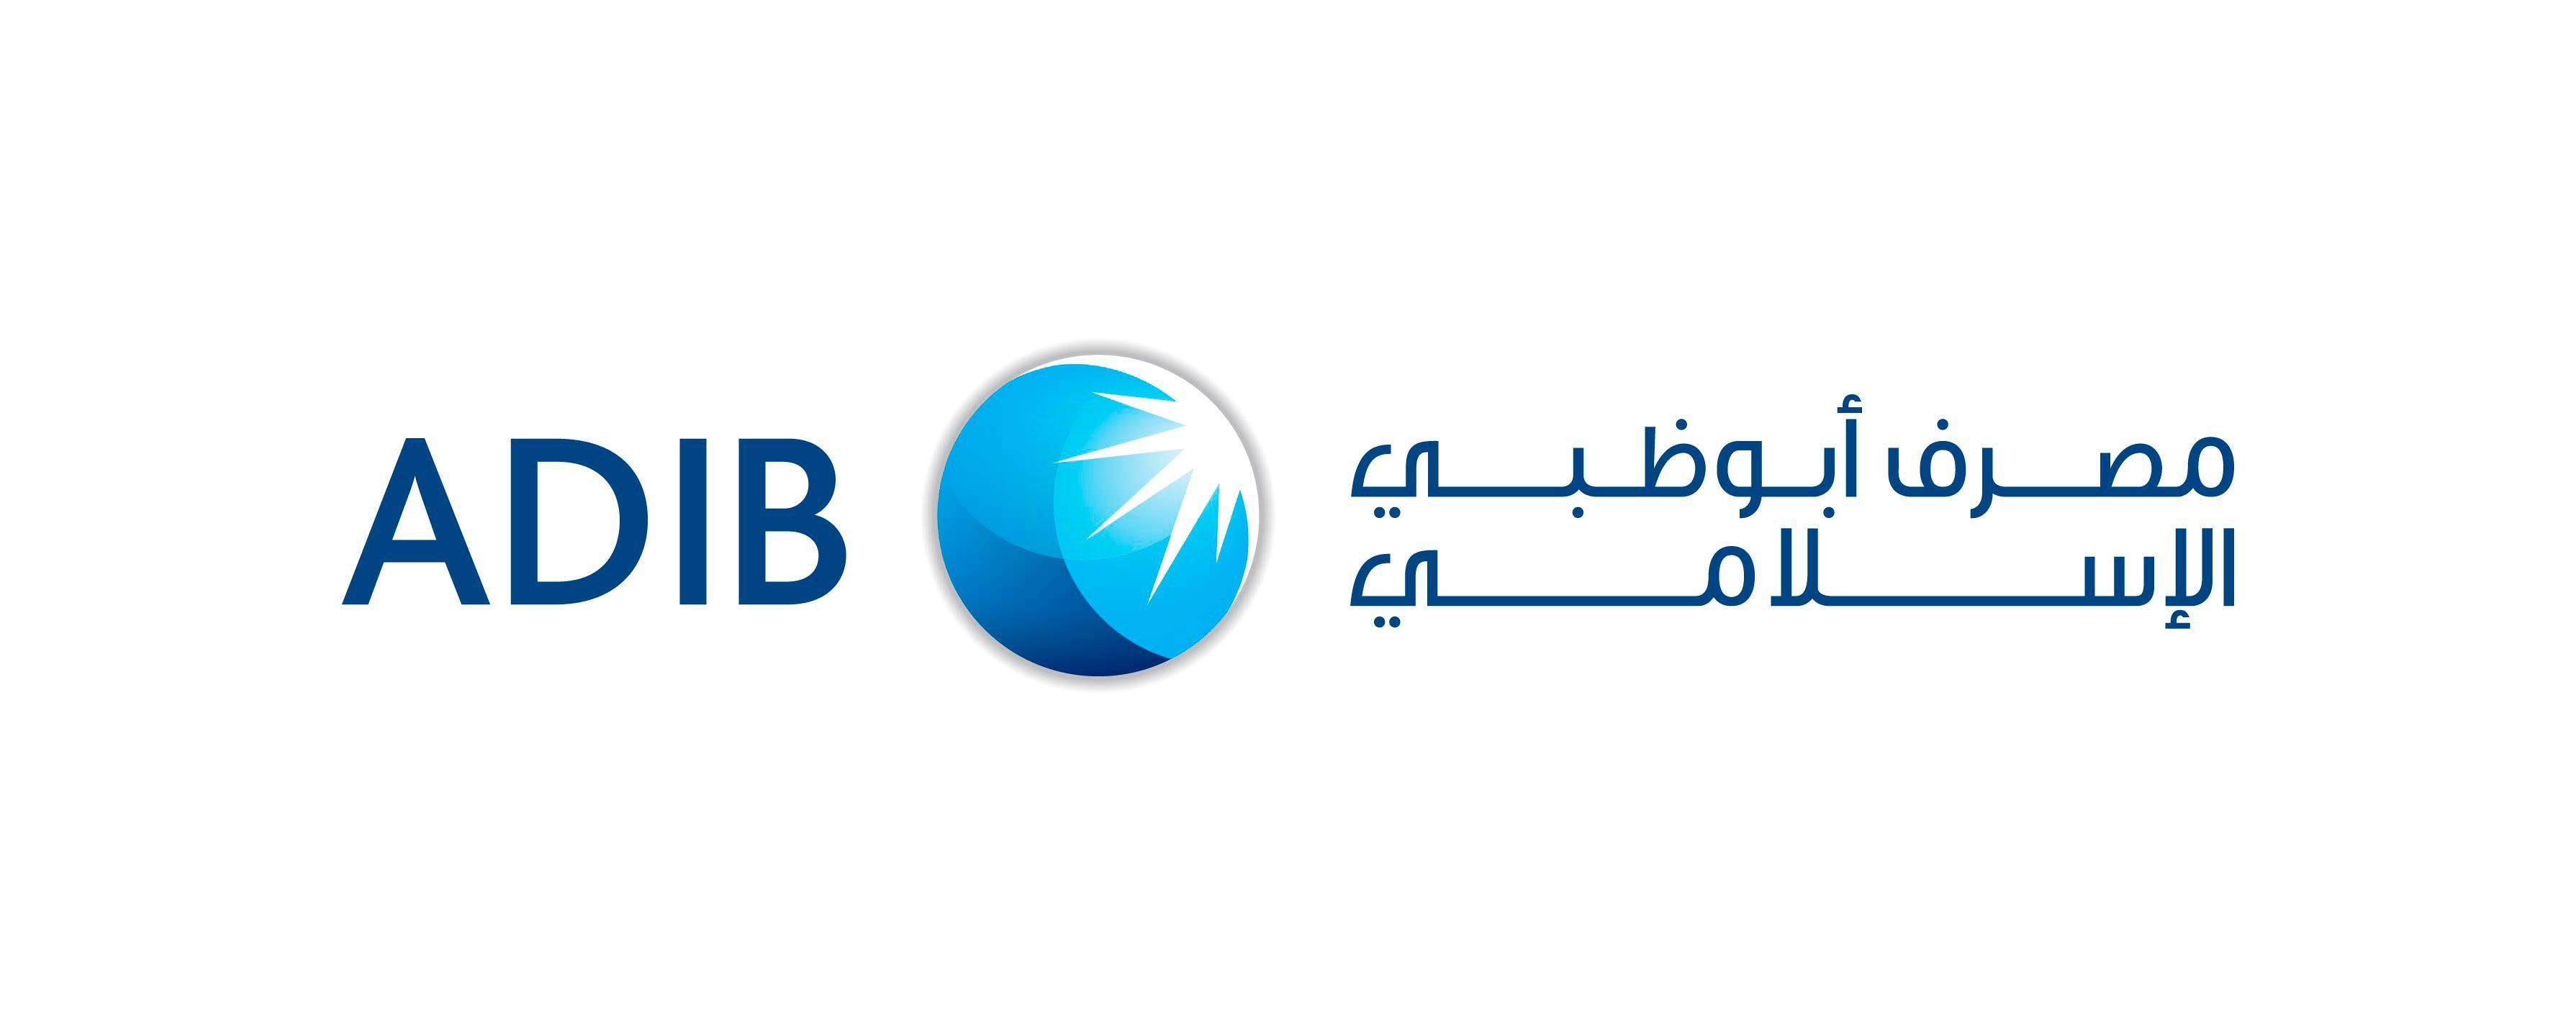 Adib Abu Dhabi Islamic Bank Cool Logo Islamic Bank Banks Logo Memorandum